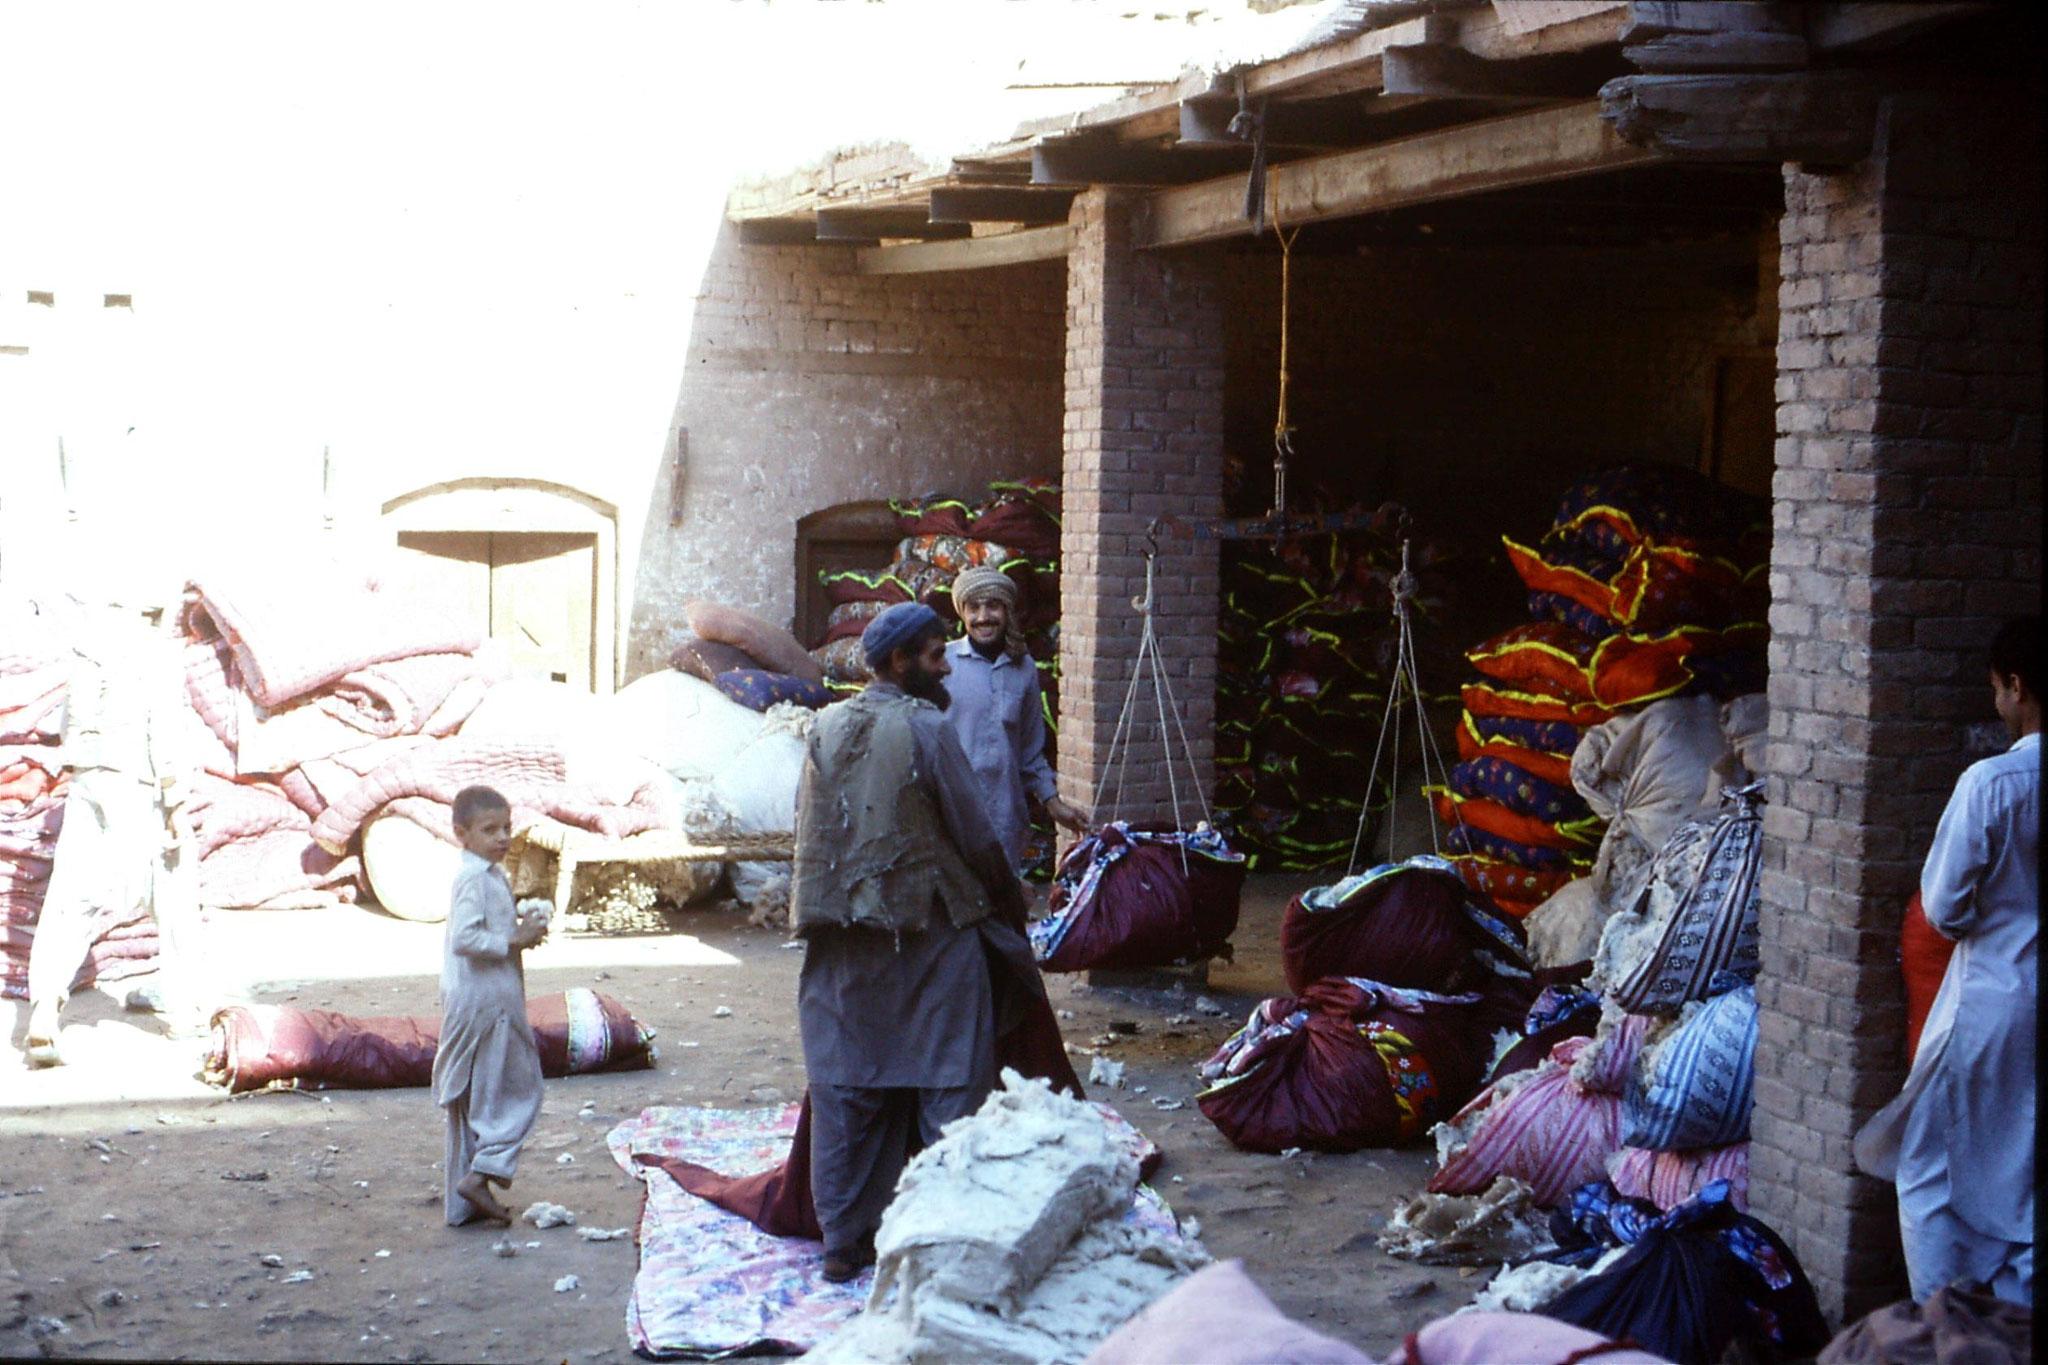 5/11/1989: 13: Peshawar, quilt factory